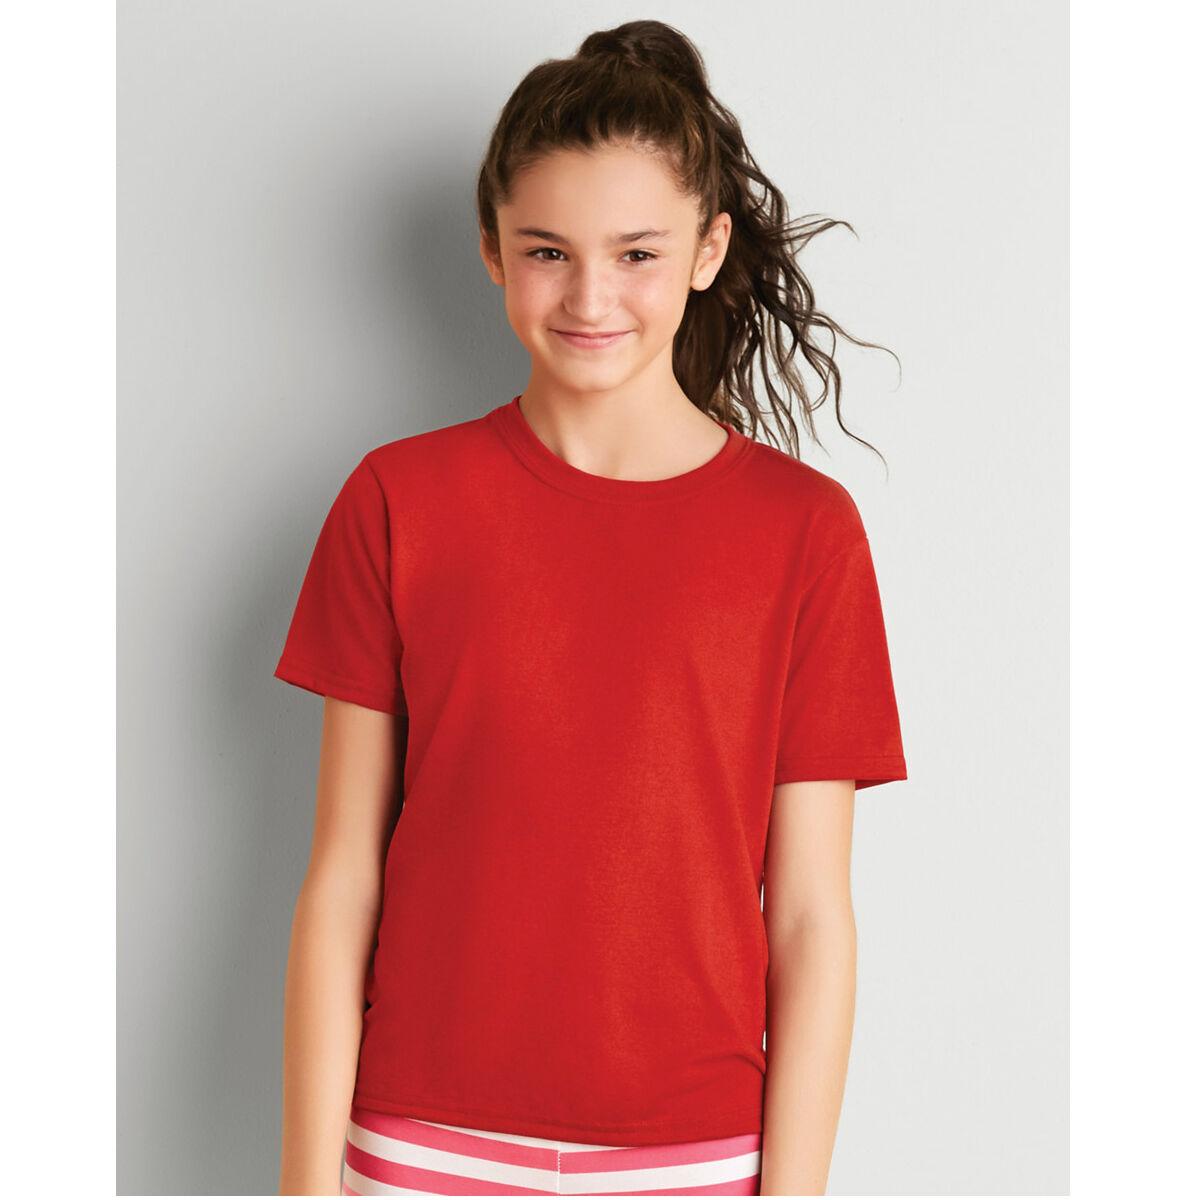 Gildan Kids Performance T-shirts